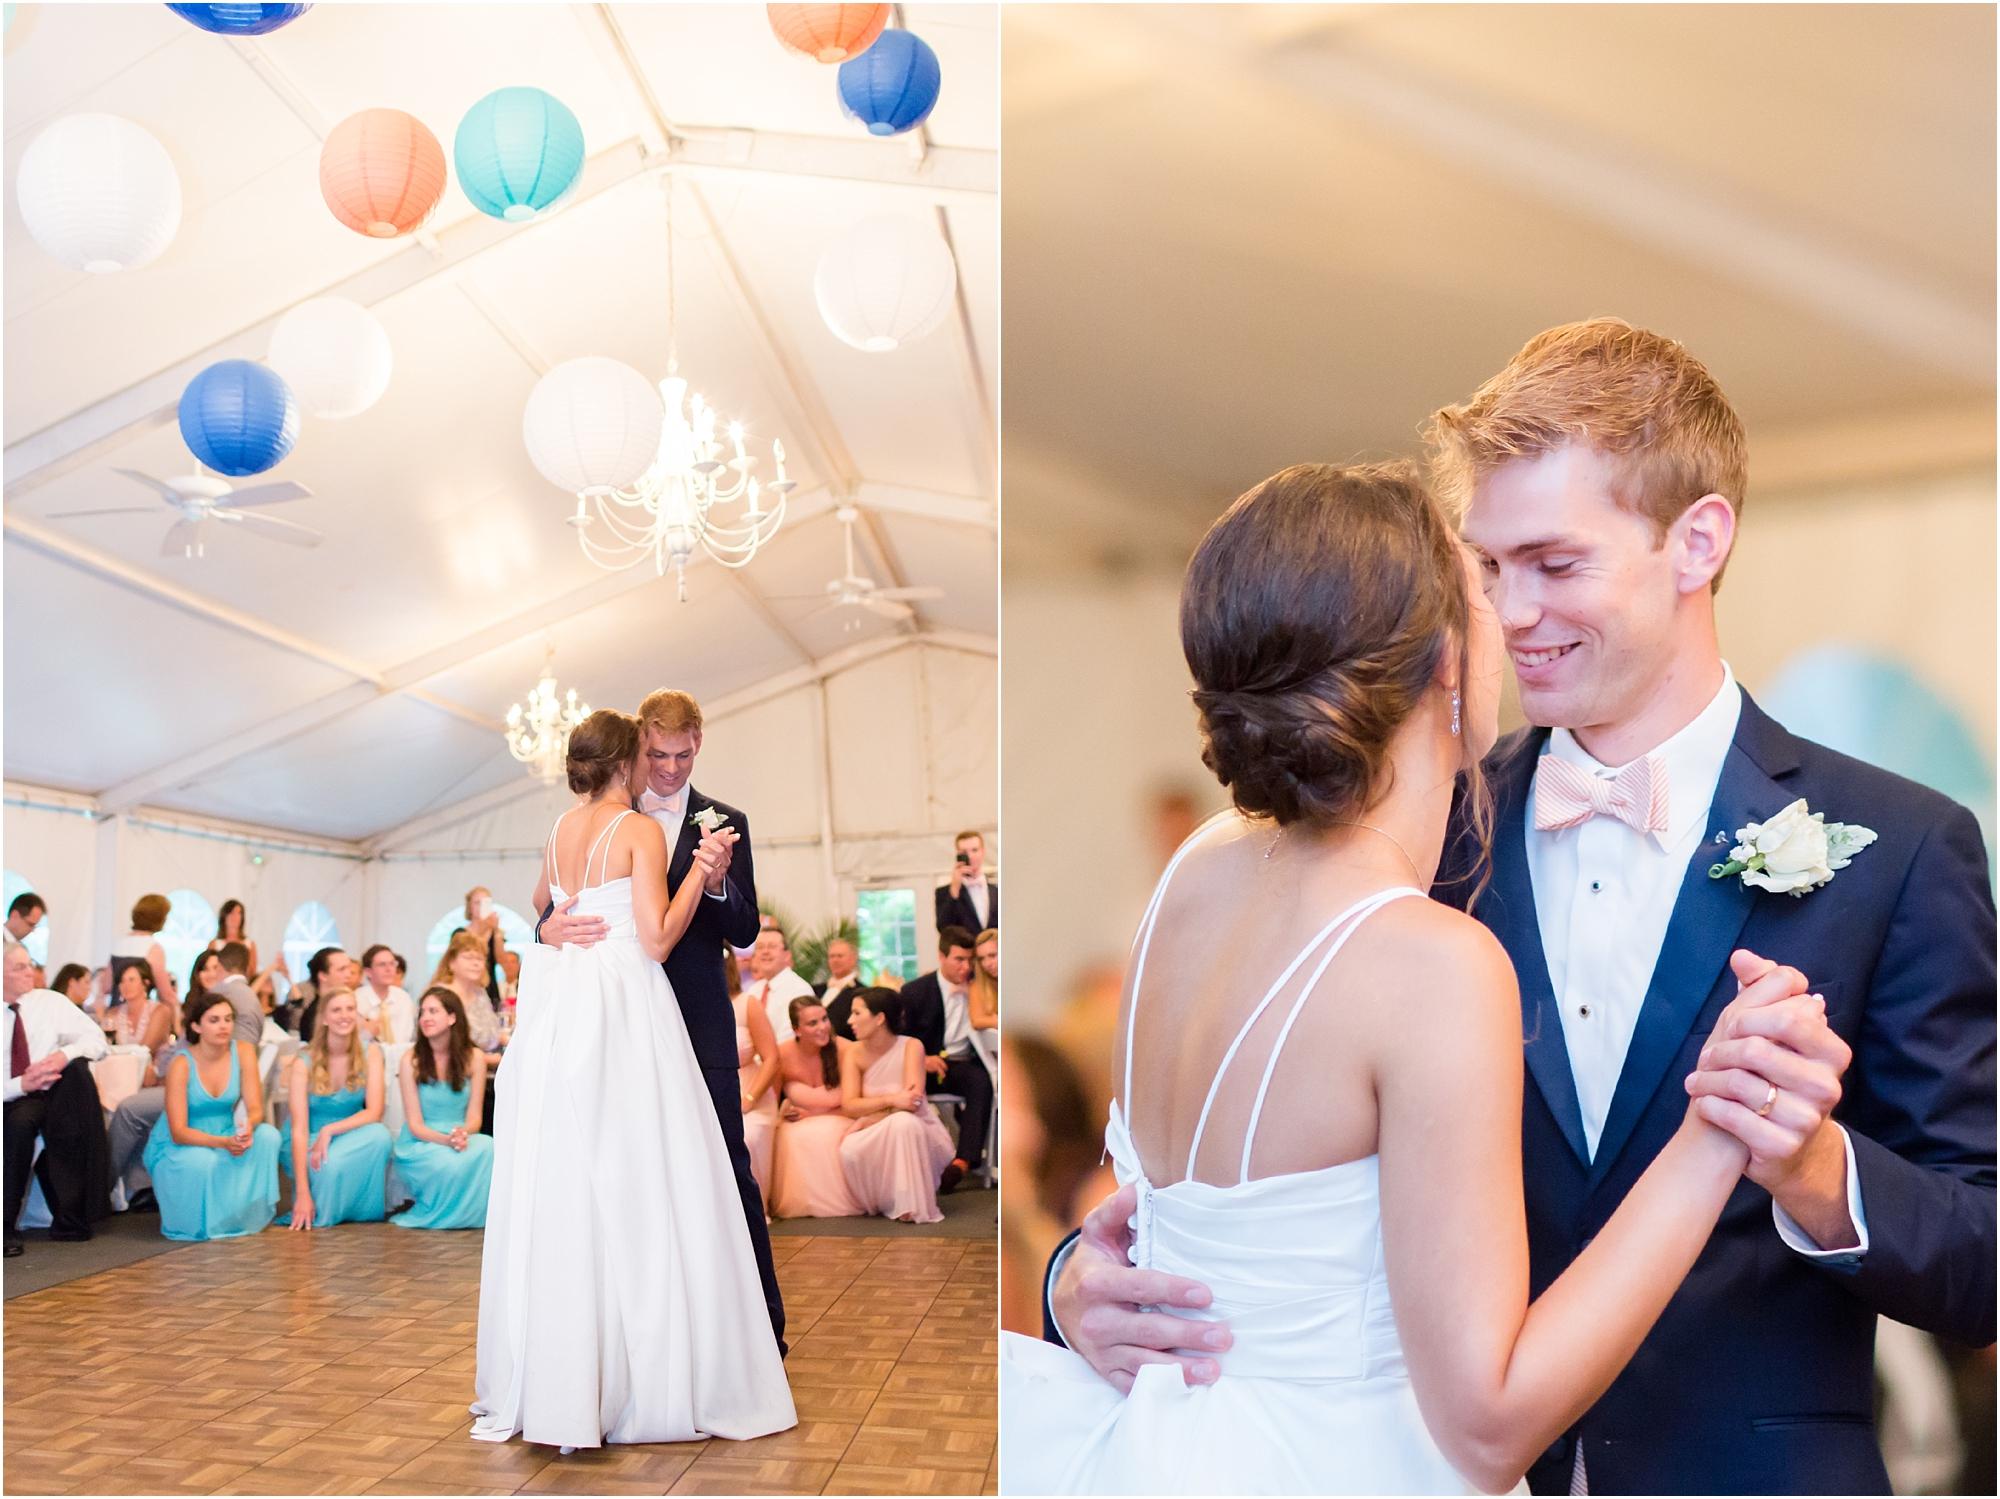 Russell 6-Reception-927_anna grace photography baltimore maryland wedding photographer elkridge furnace inn wedding photo.jpg